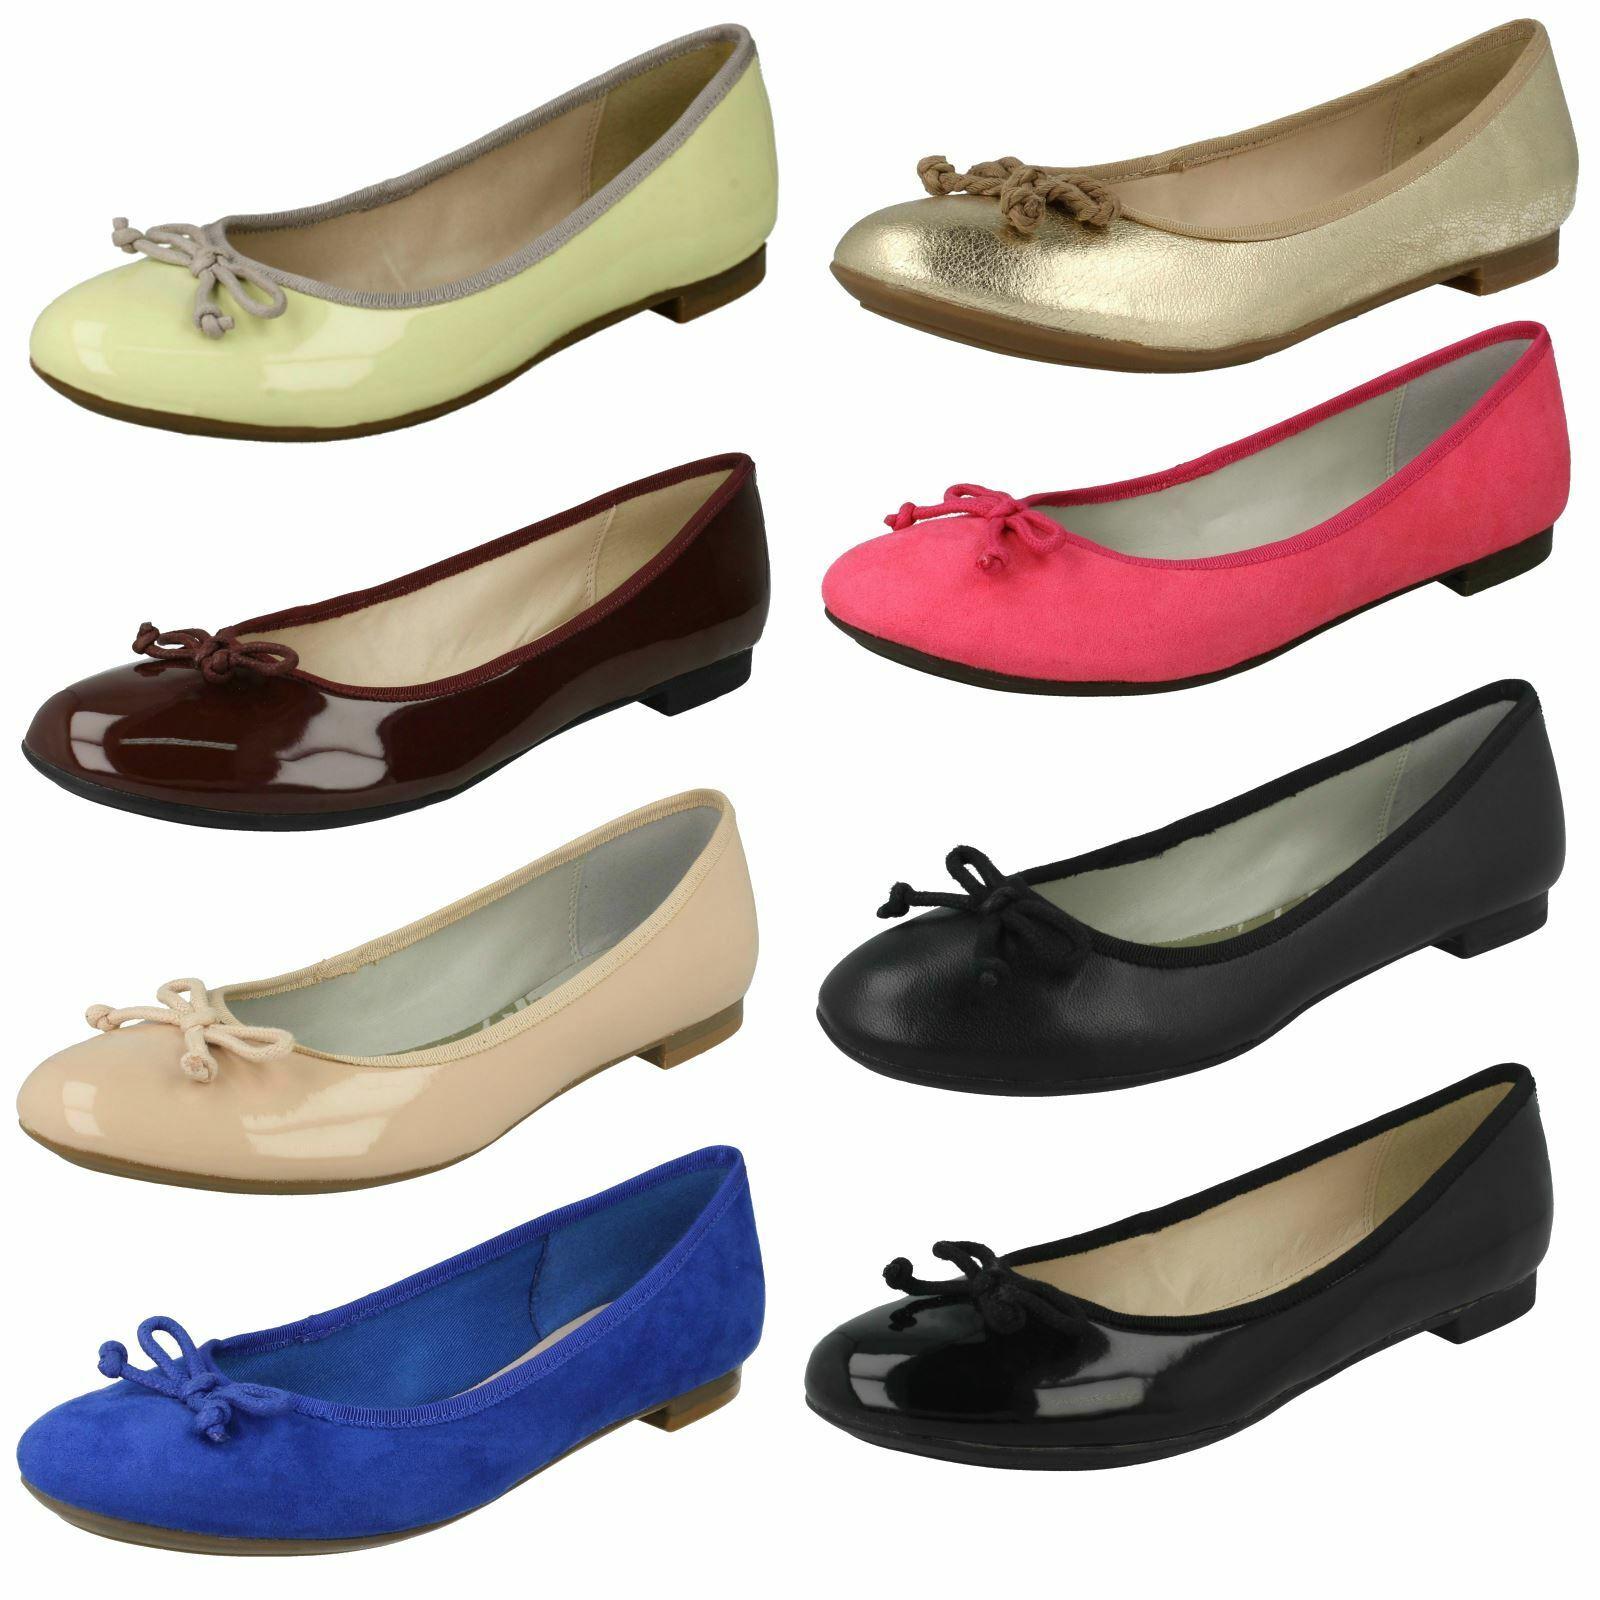 Ladies Clarks Flat Ballerina shoes Carousel Ride